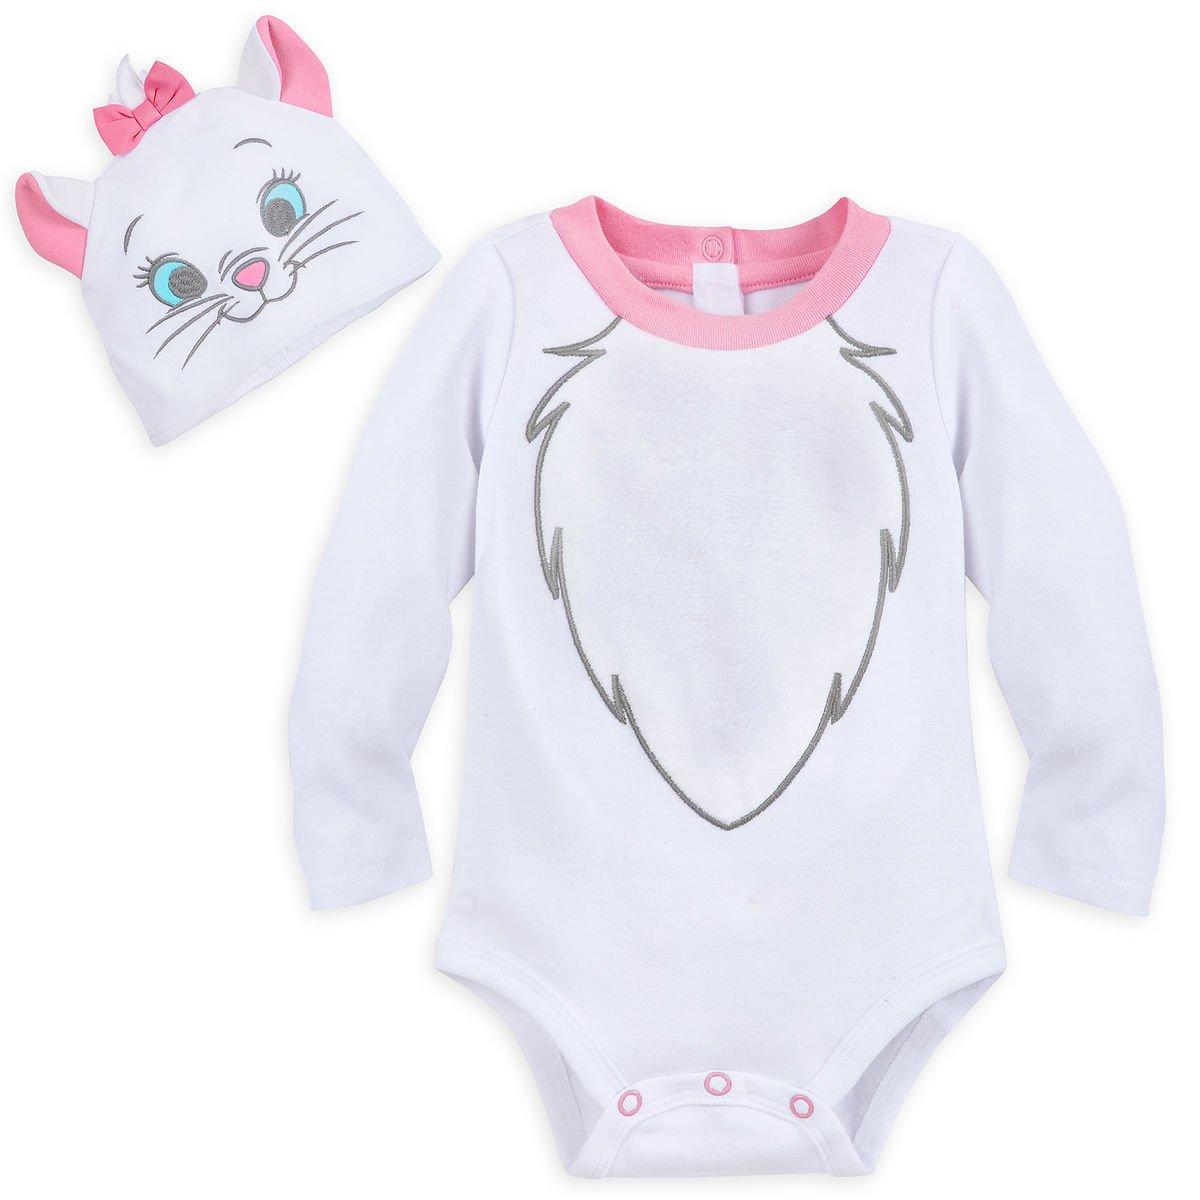 Disney Store Marie Baby Costume Bodysuit Hat 0-3 Months 2018 New